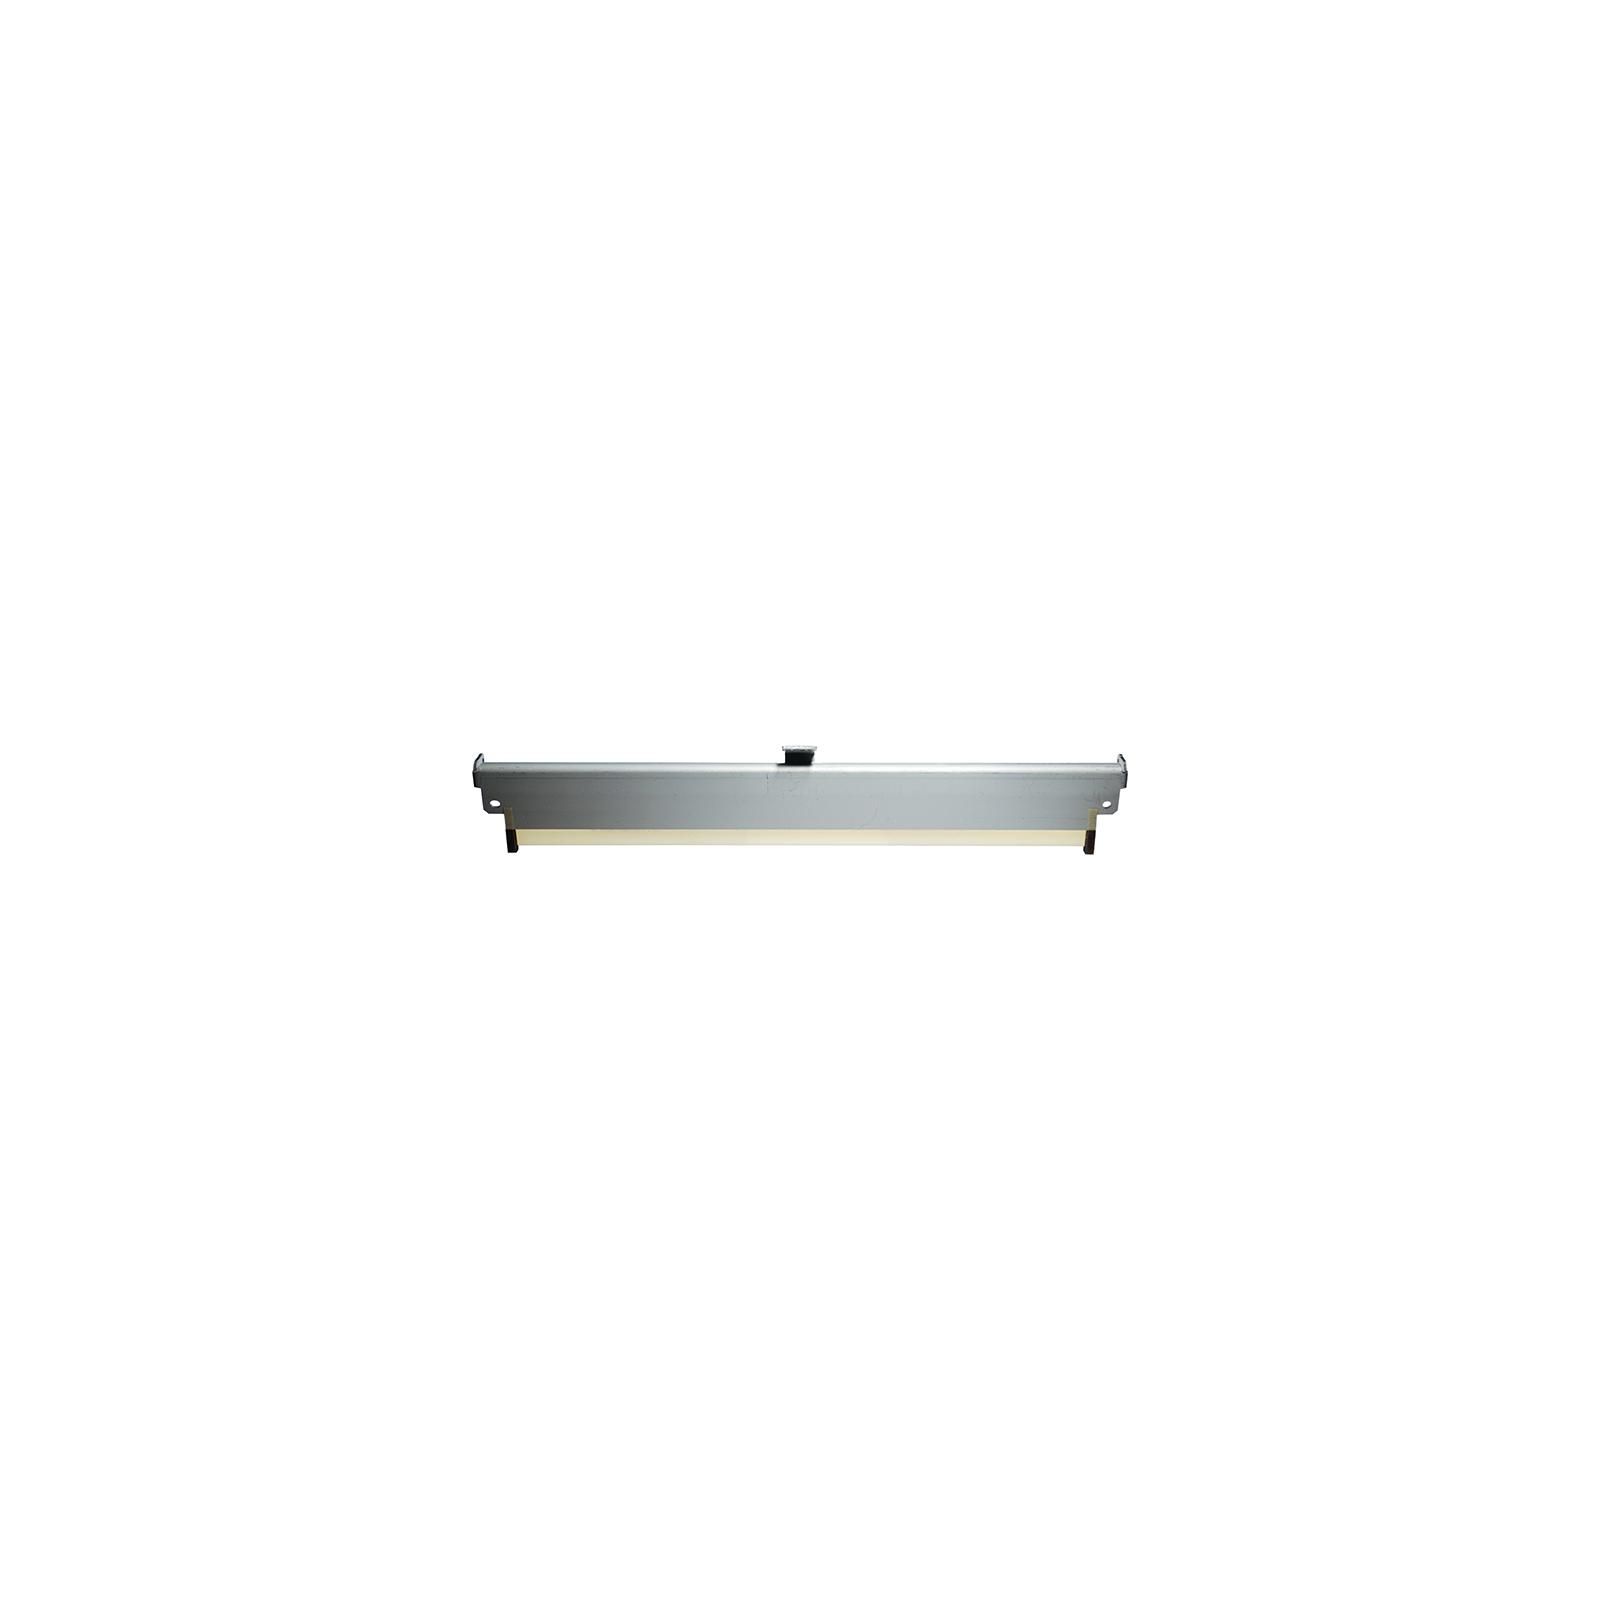 Чистящее лезвие Konica Minolta Mc2300/2350 Static Control (QMS23BLADE)